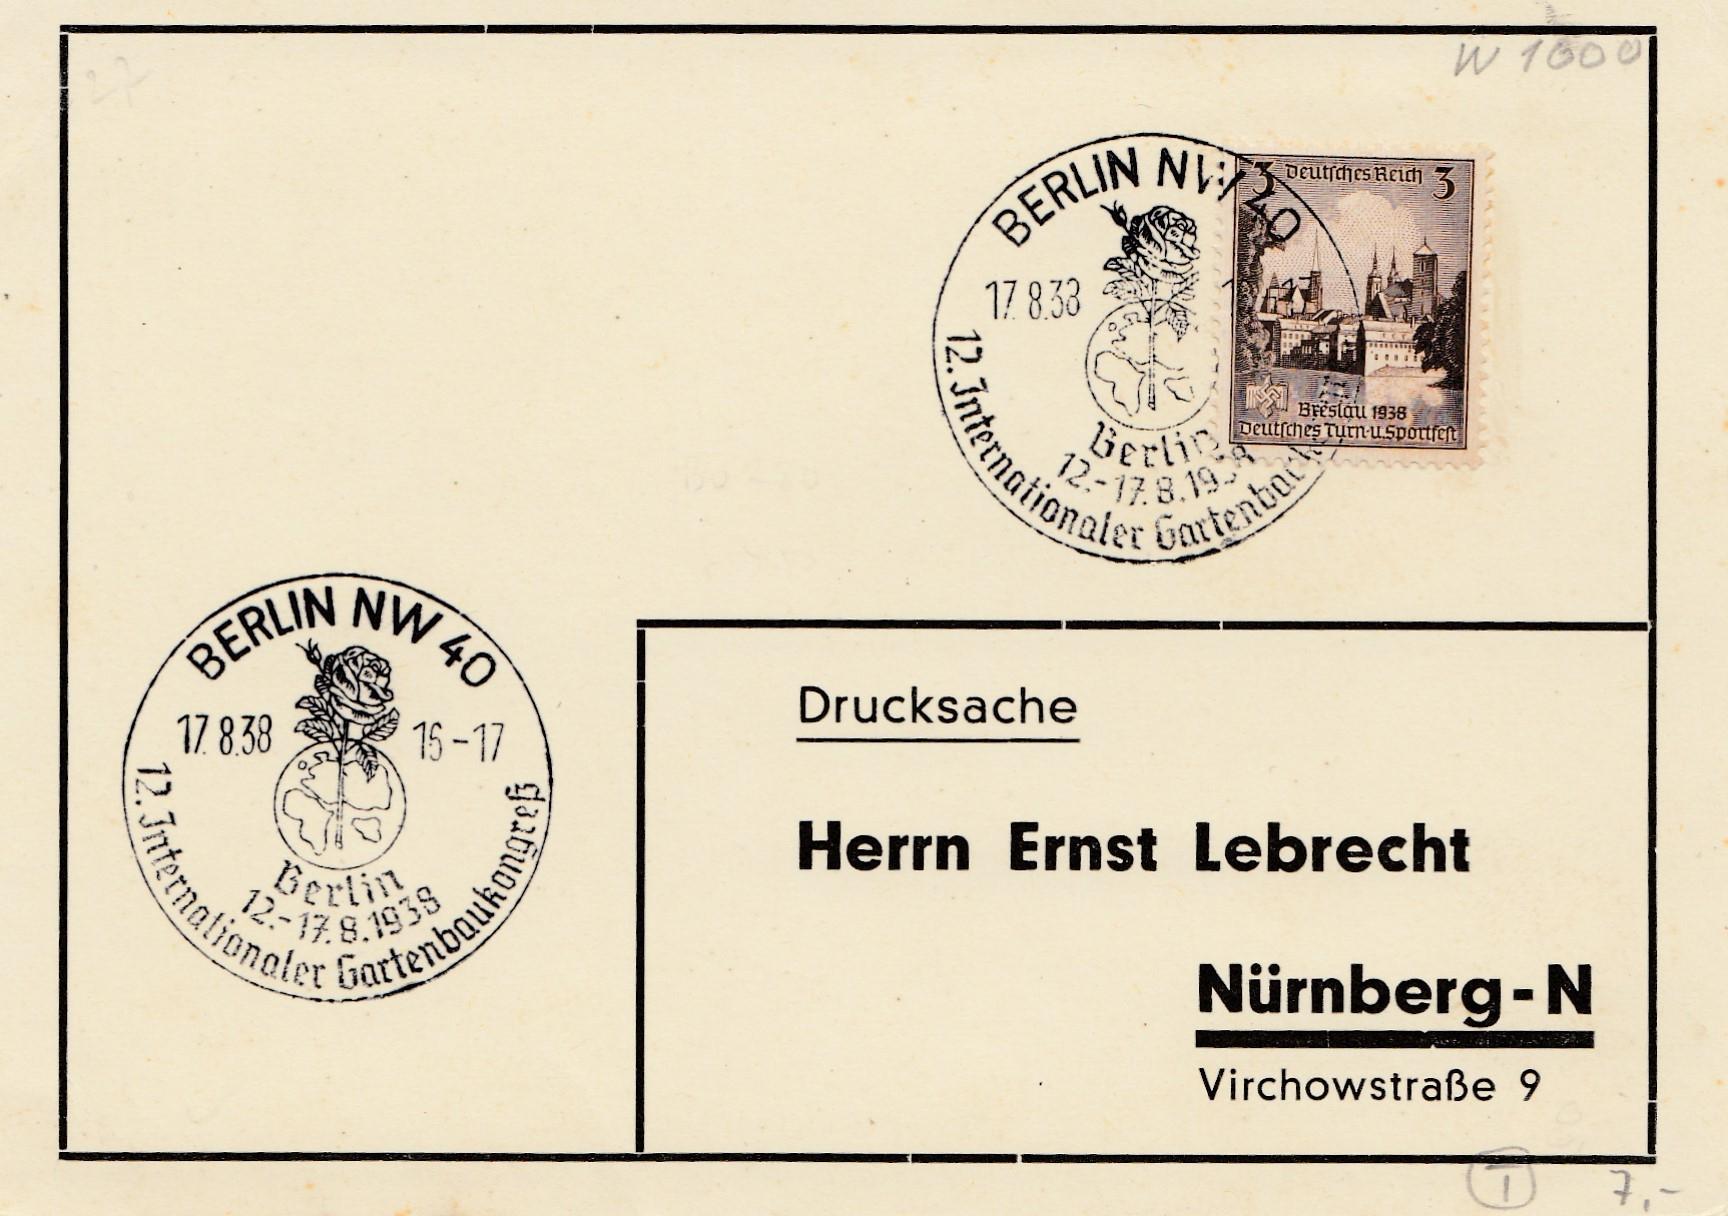 Gartenbau Nürnberg berlin internat gartenbau kongress 1938 nach nürnberg philarena